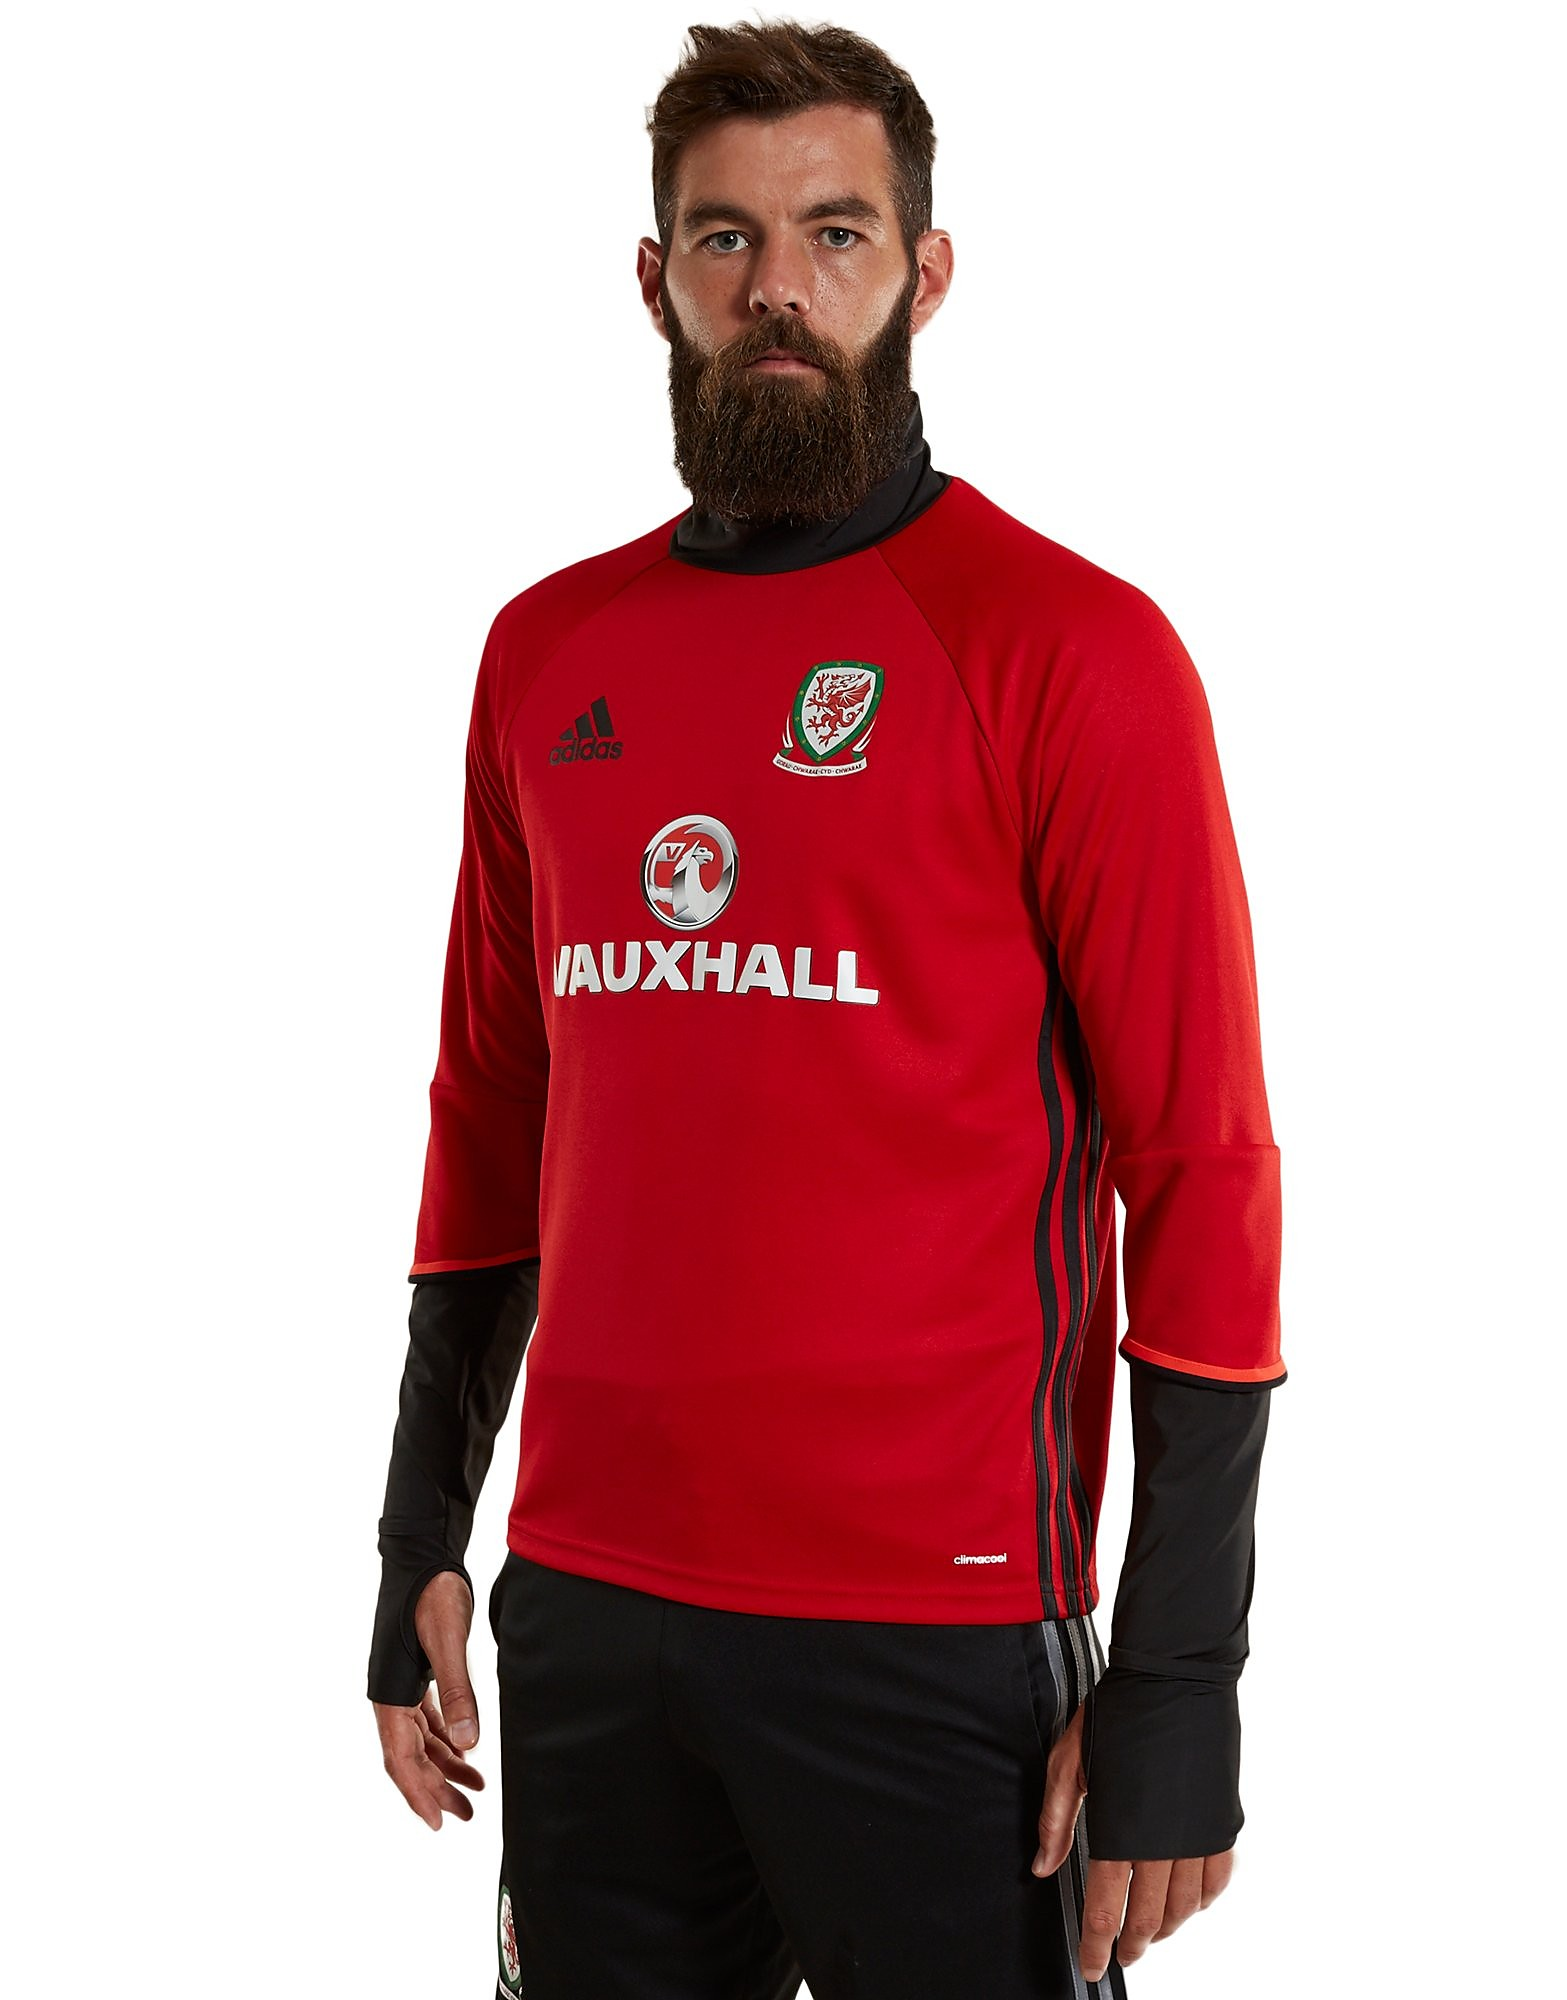 adidas Wales 2016/17 Training Top